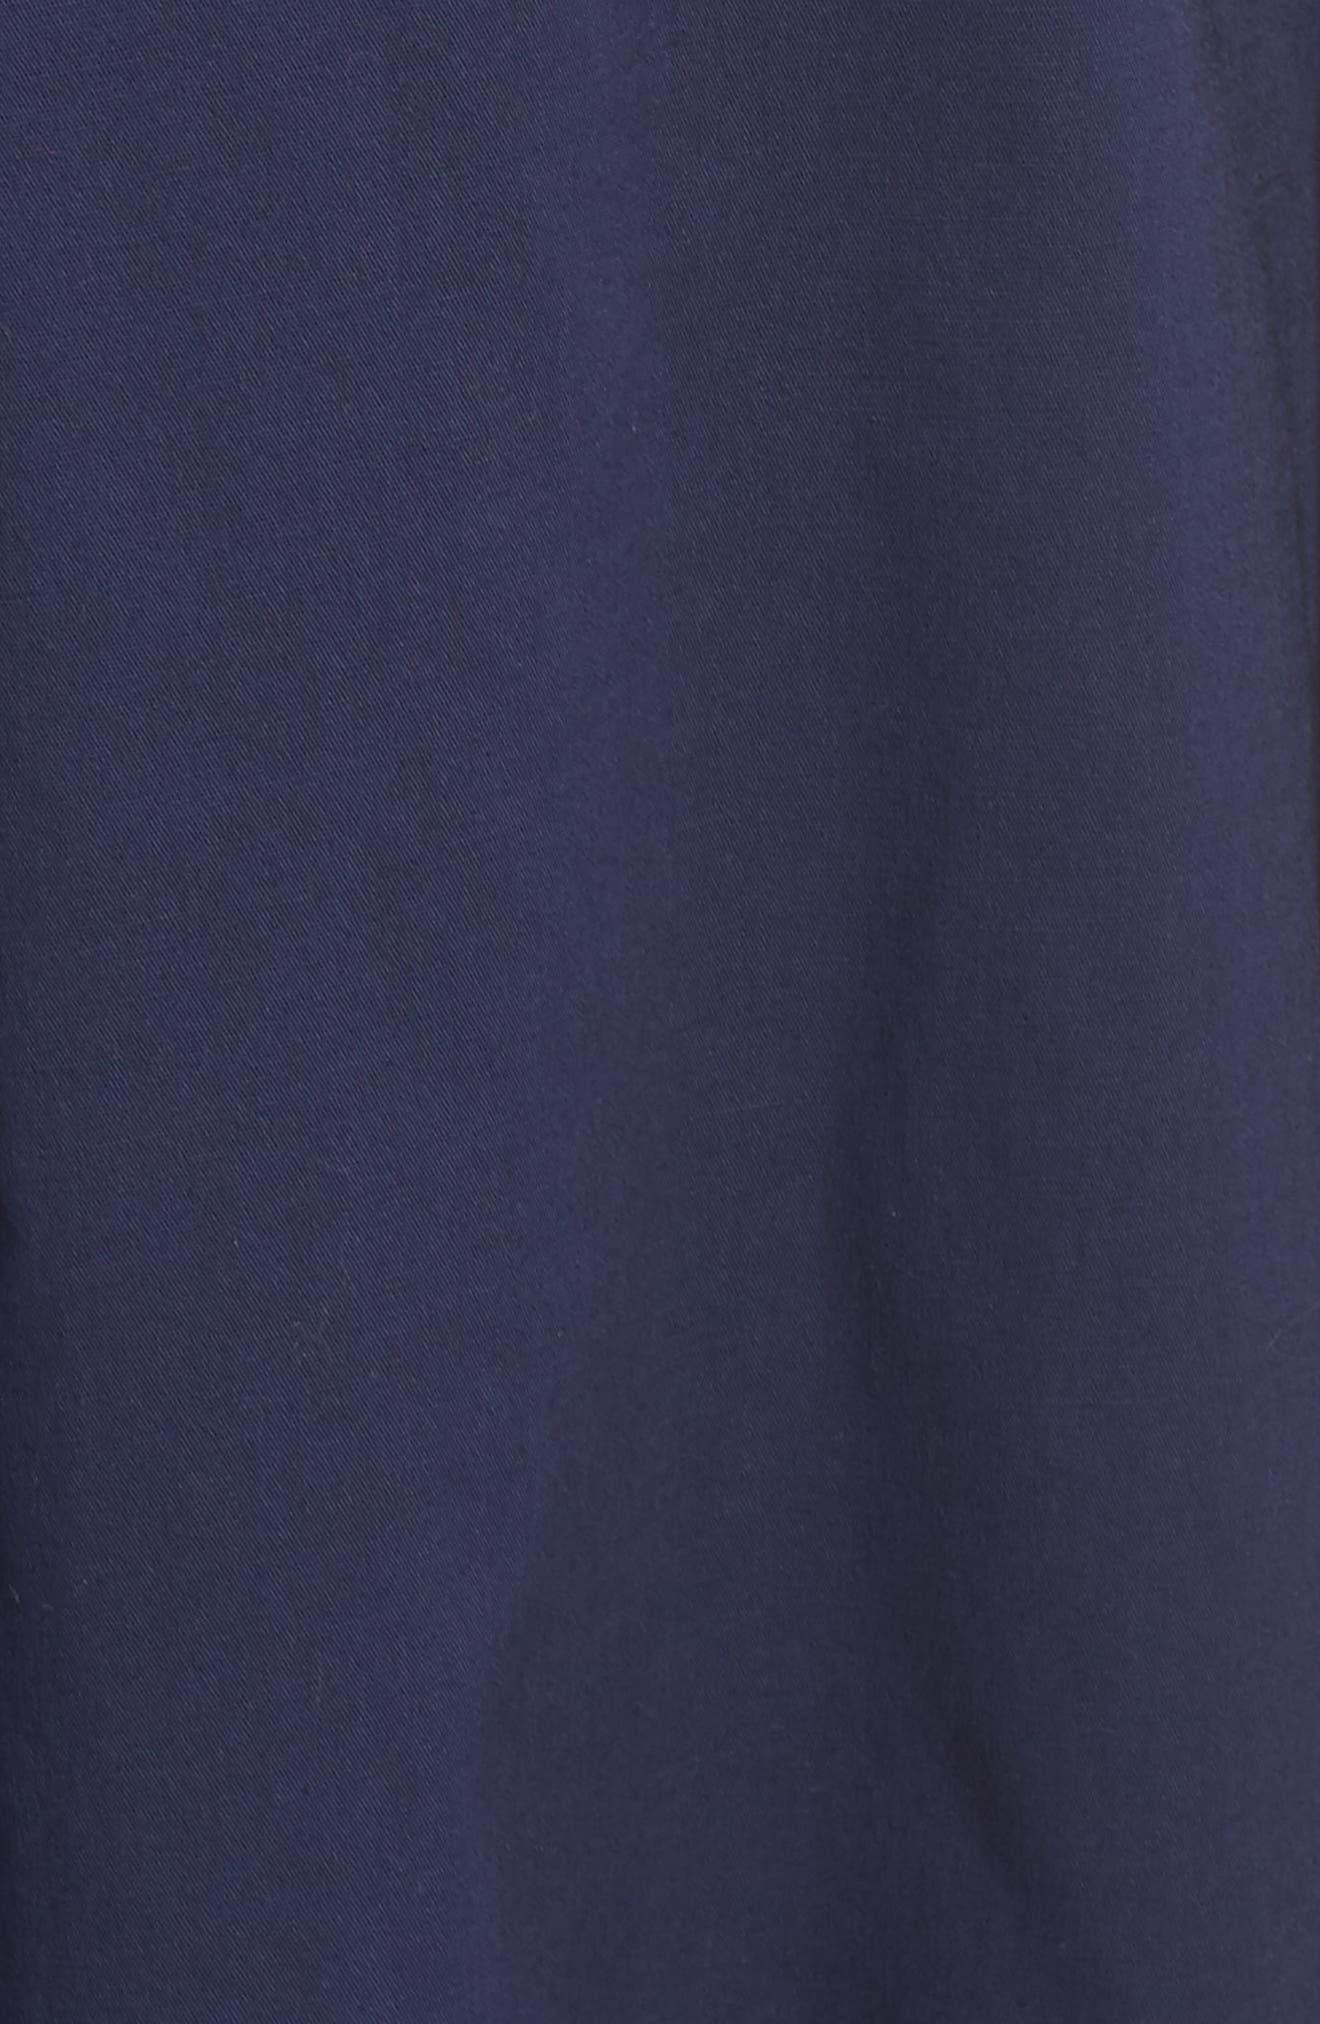 Rose Sleeveless Cotton Poplin Shirtdress,                             Alternate thumbnail 7, color,                             Navy